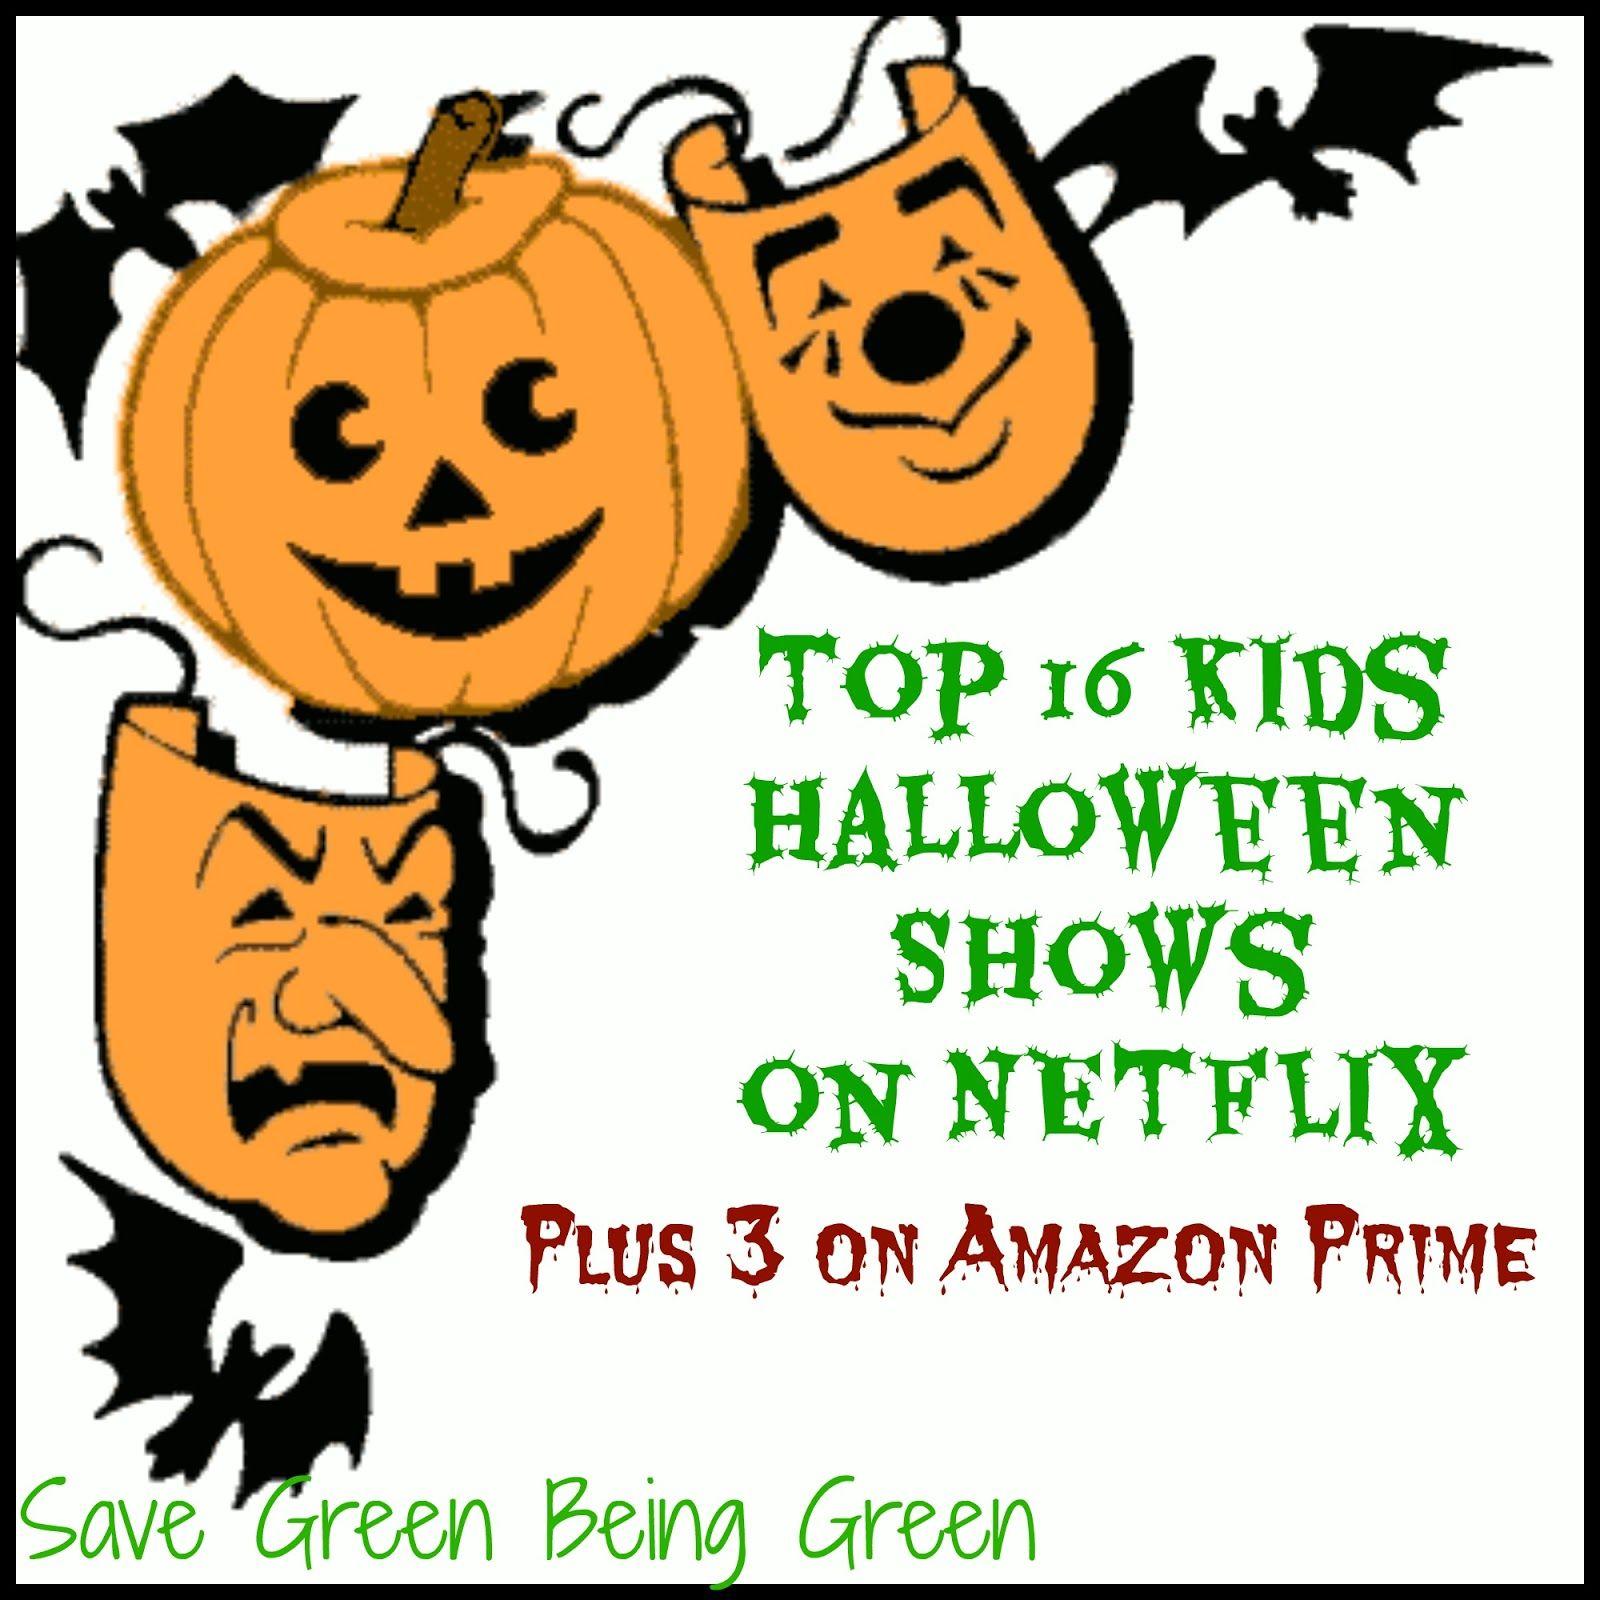 Top 16 Kids Halloween Shows on Netflix (Oct '15) PLUS 3 on